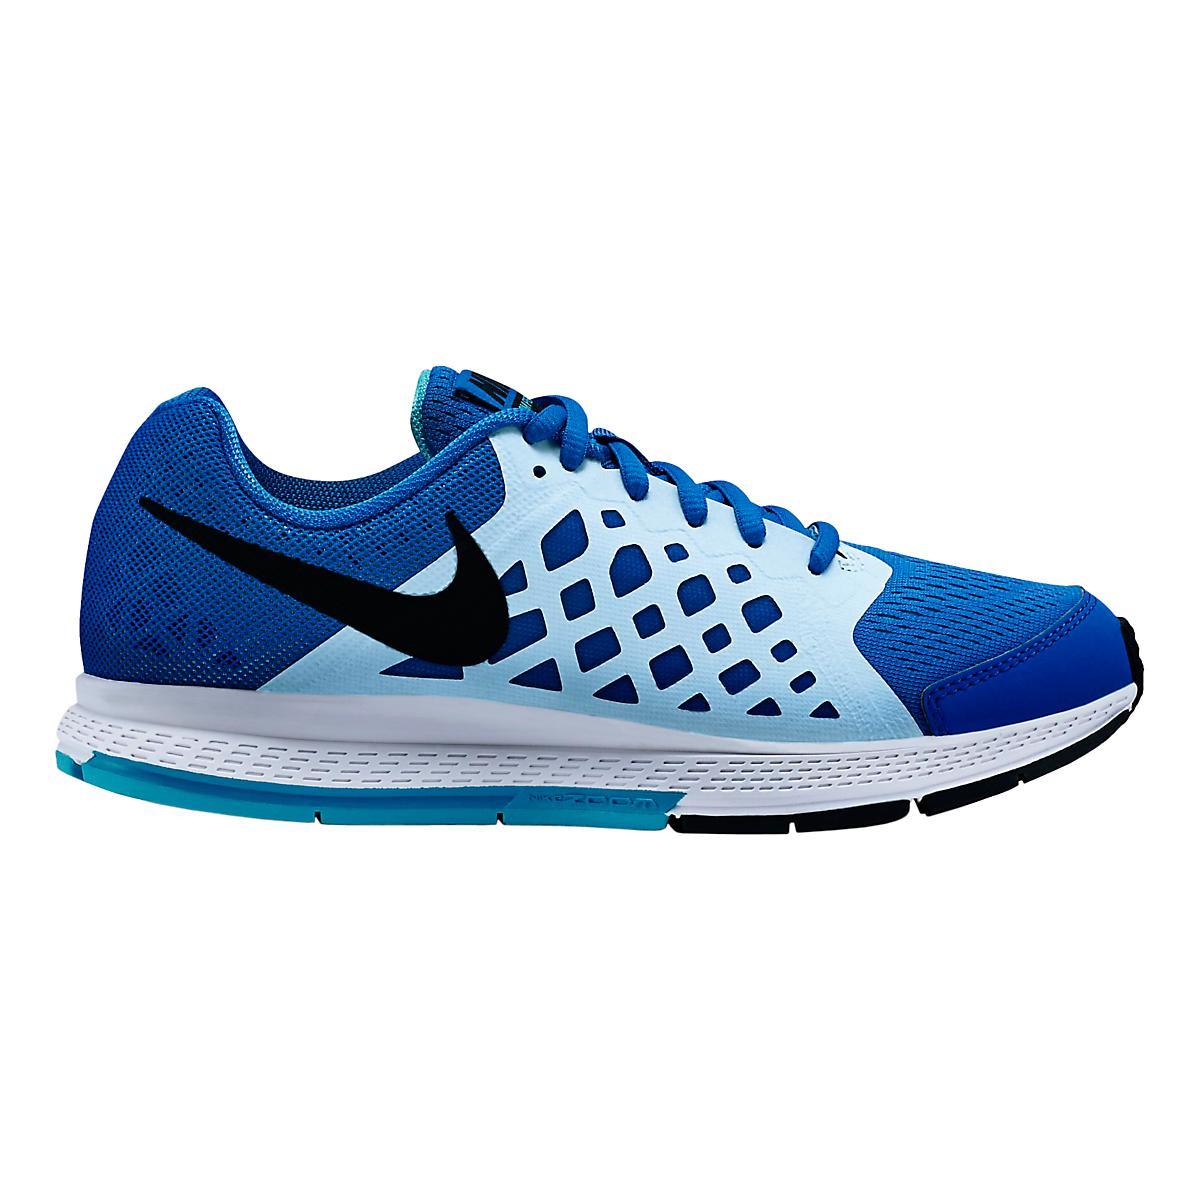 best service d9a06 8b1e6 Kids Nike Air Zoom Pegasus 31 Running Shoe